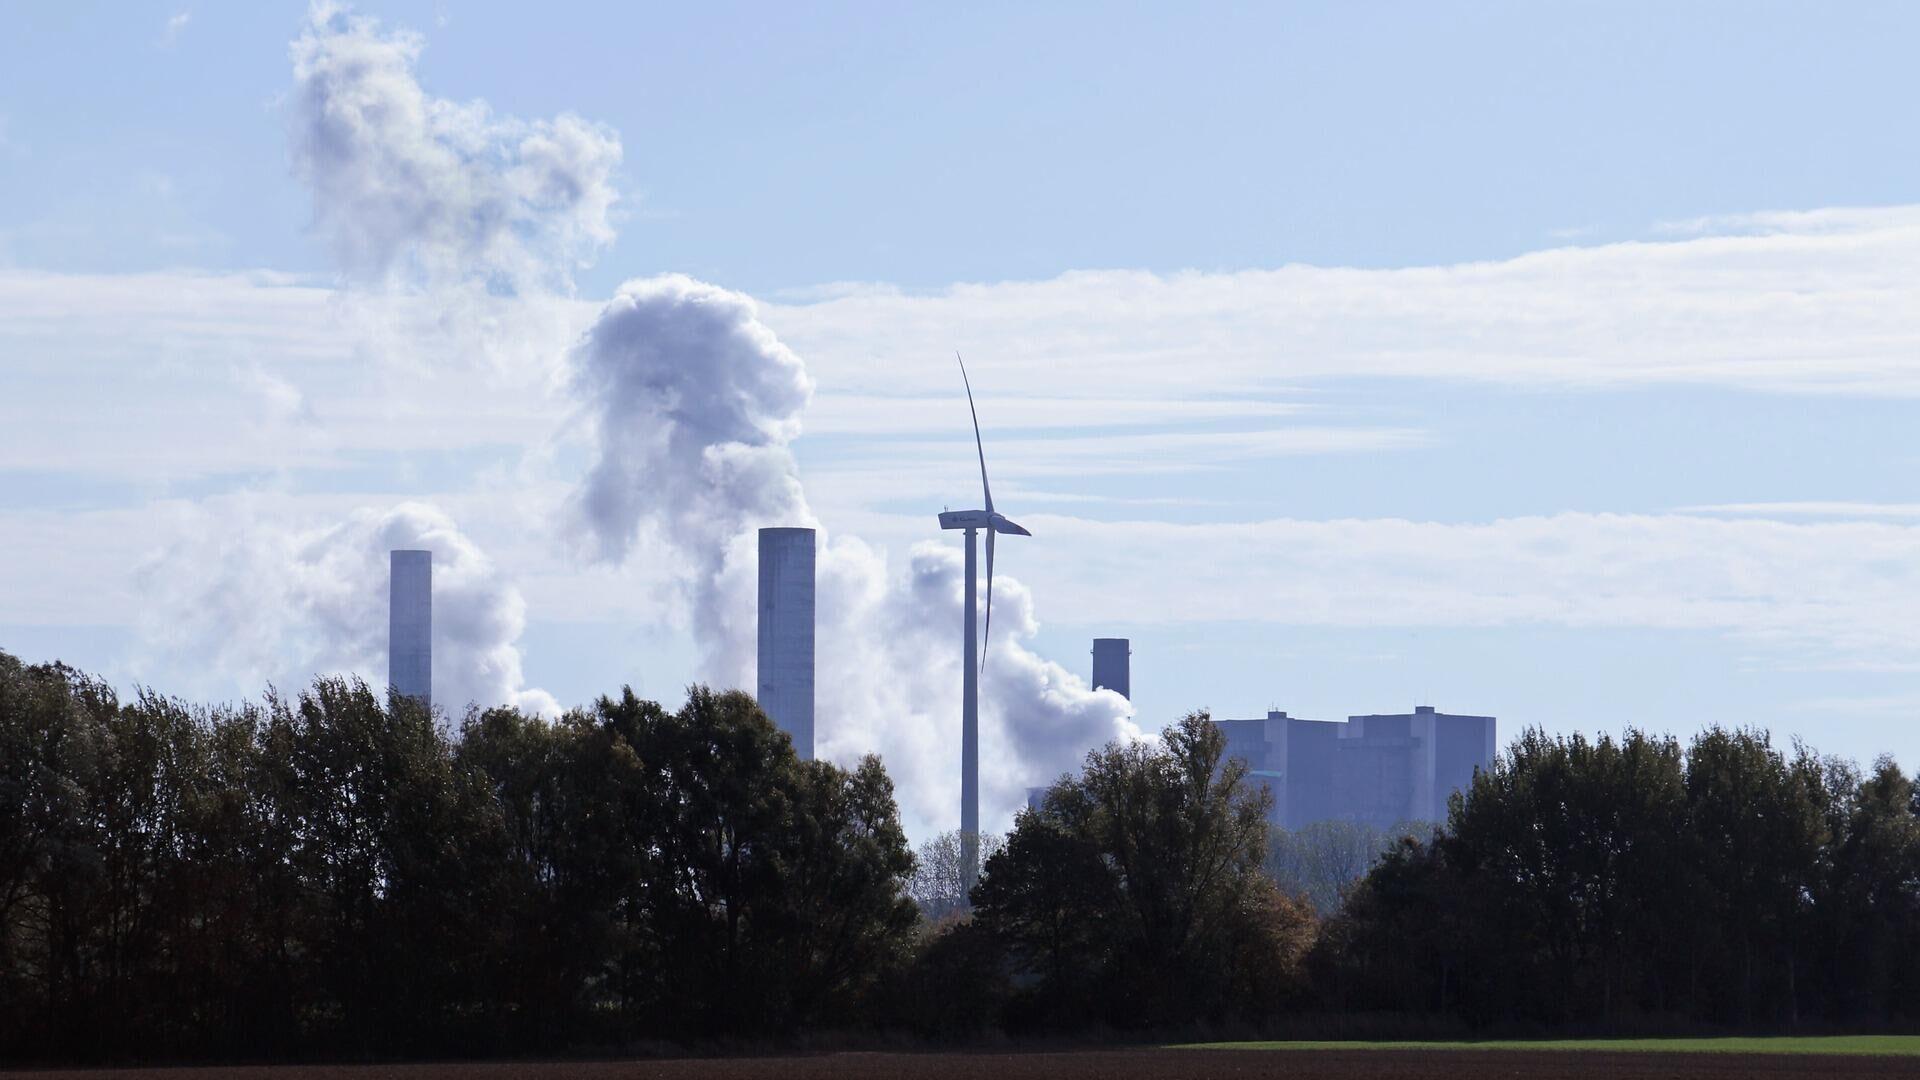 Kohlekraftwerk, Symbolbild - SNA, 1920, 22.09.2021